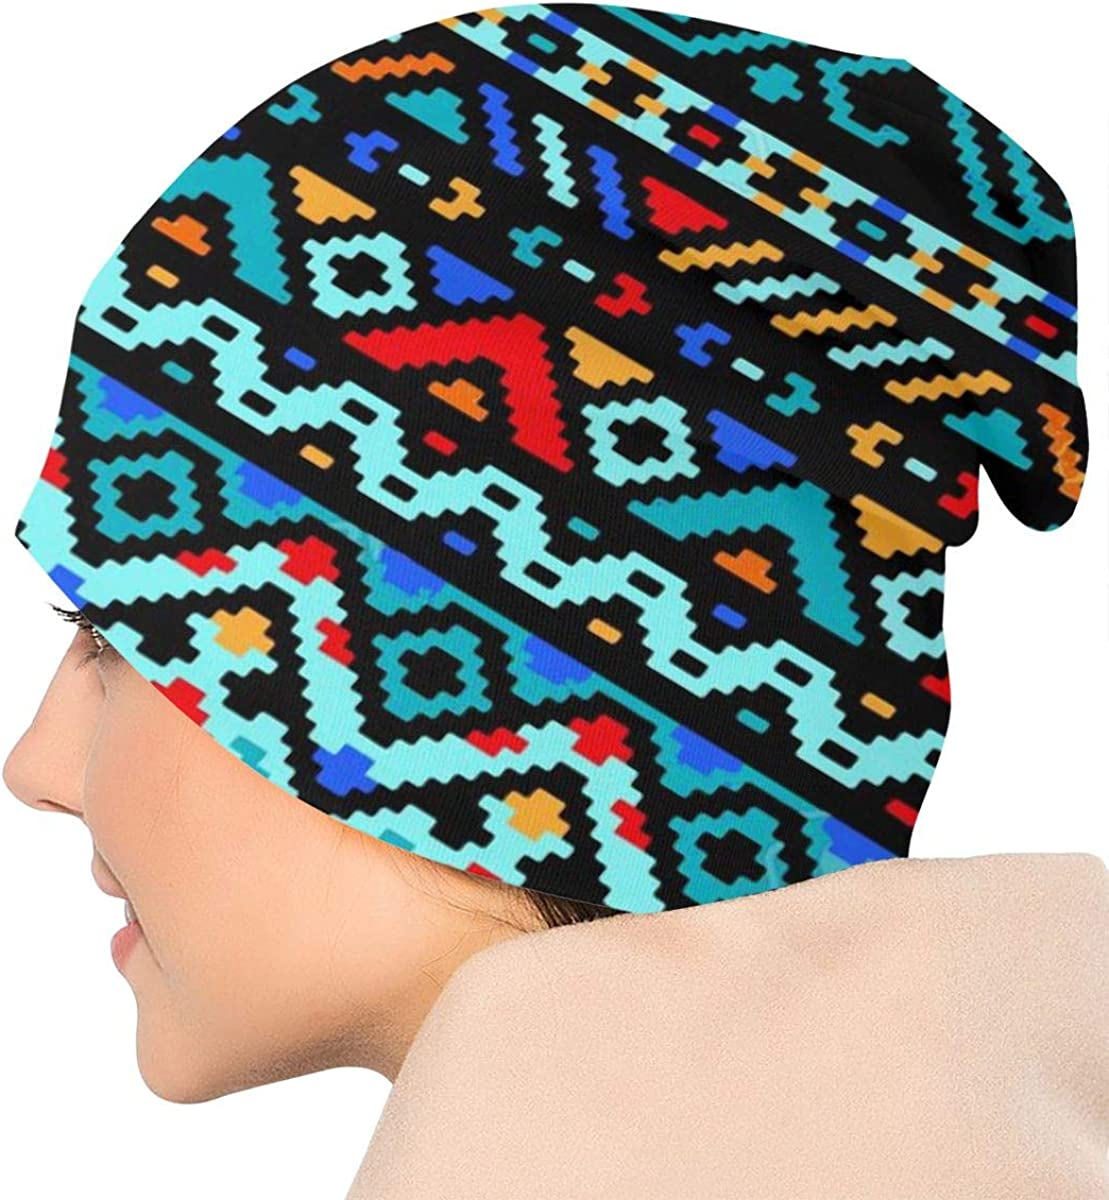 HHTZTCL Azteca Patterns Mens Womens Winter Beanies Knit Hat Stretch Skull Cap Black